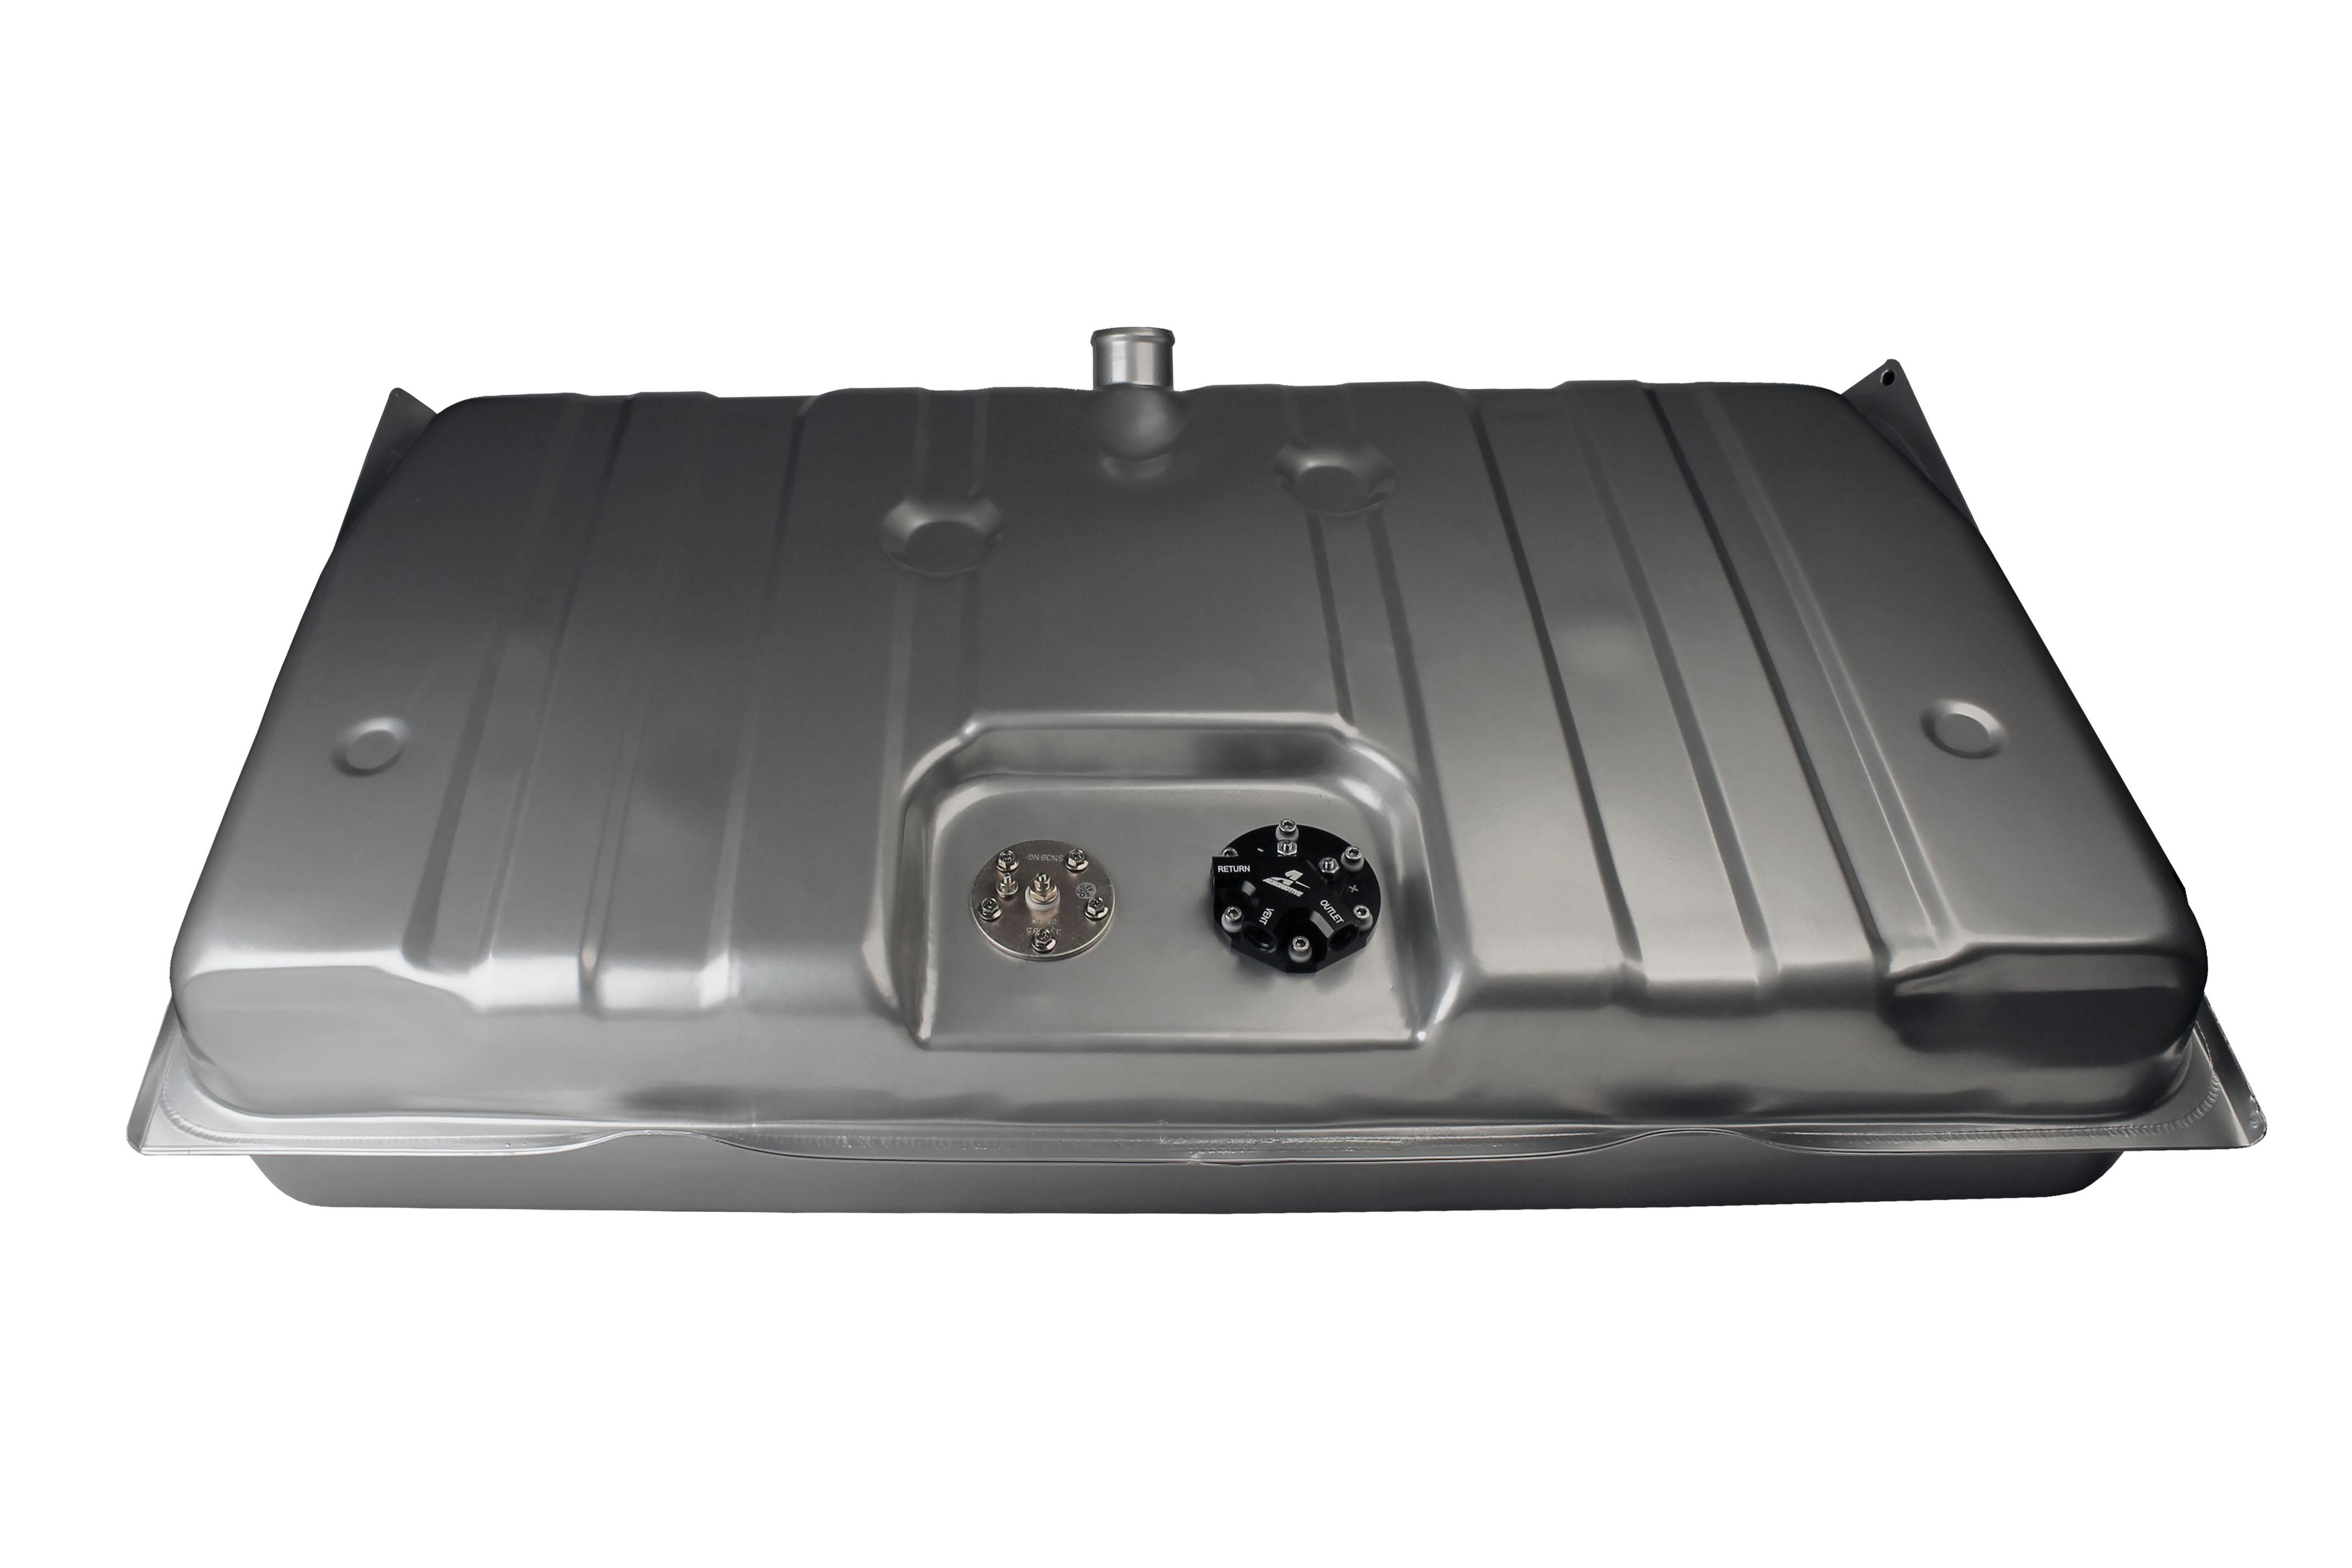 70-73 Camaro Firebird Fuel Tank